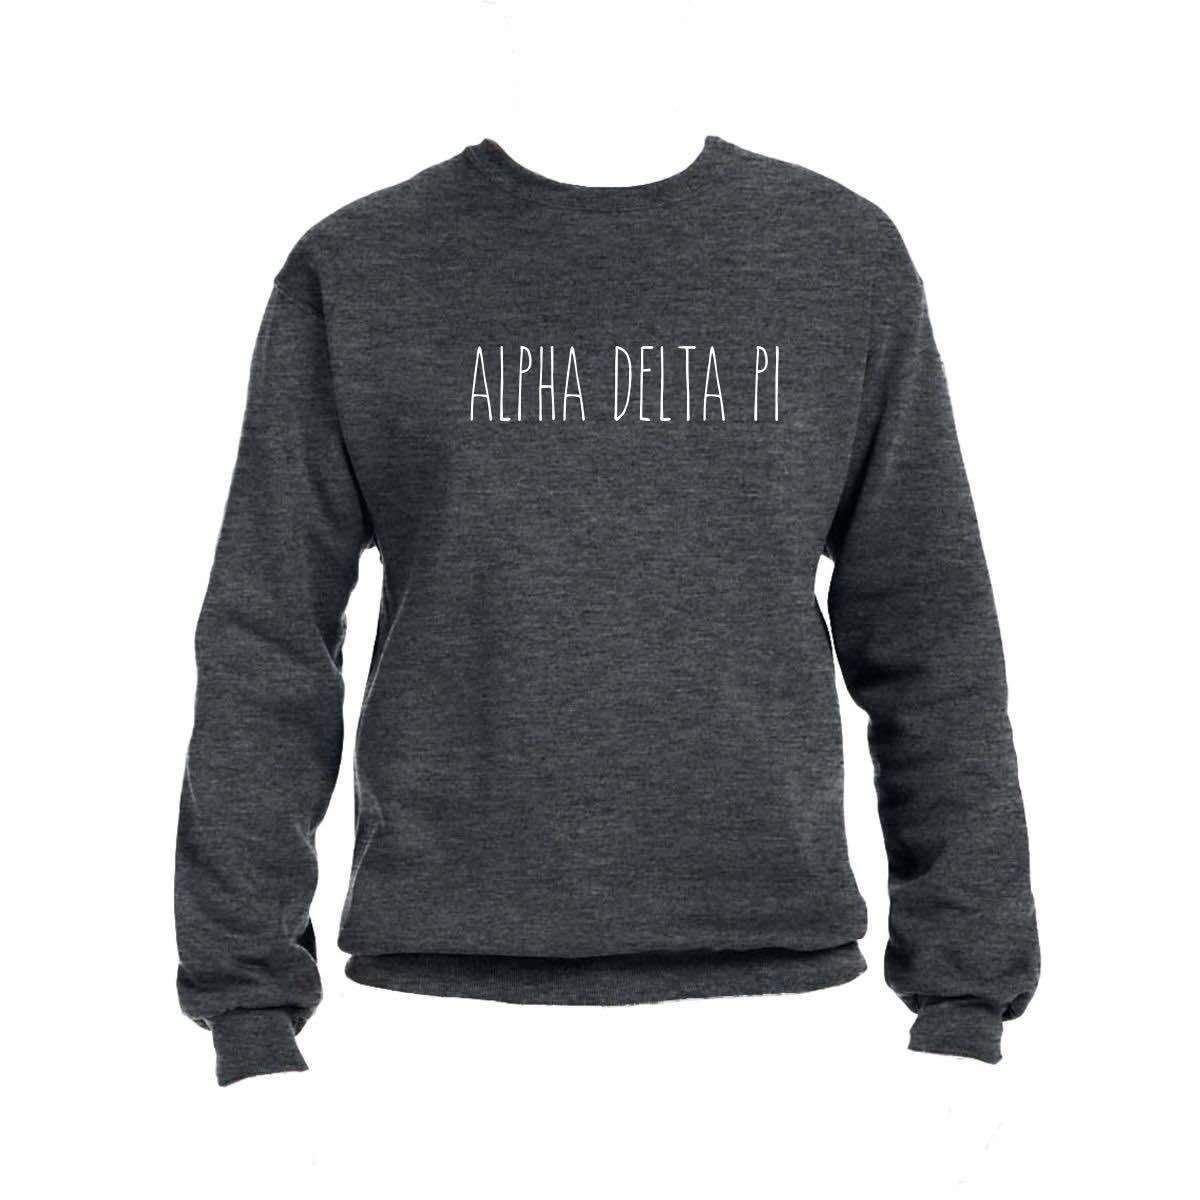 Alpha Delta Pi Sweatshirt I Sorority Name I Simply Thin Style Sweatshirts Alpha Phi Sweatshirt Sorority Sweatshirts [ 1200 x 1200 Pixel ]